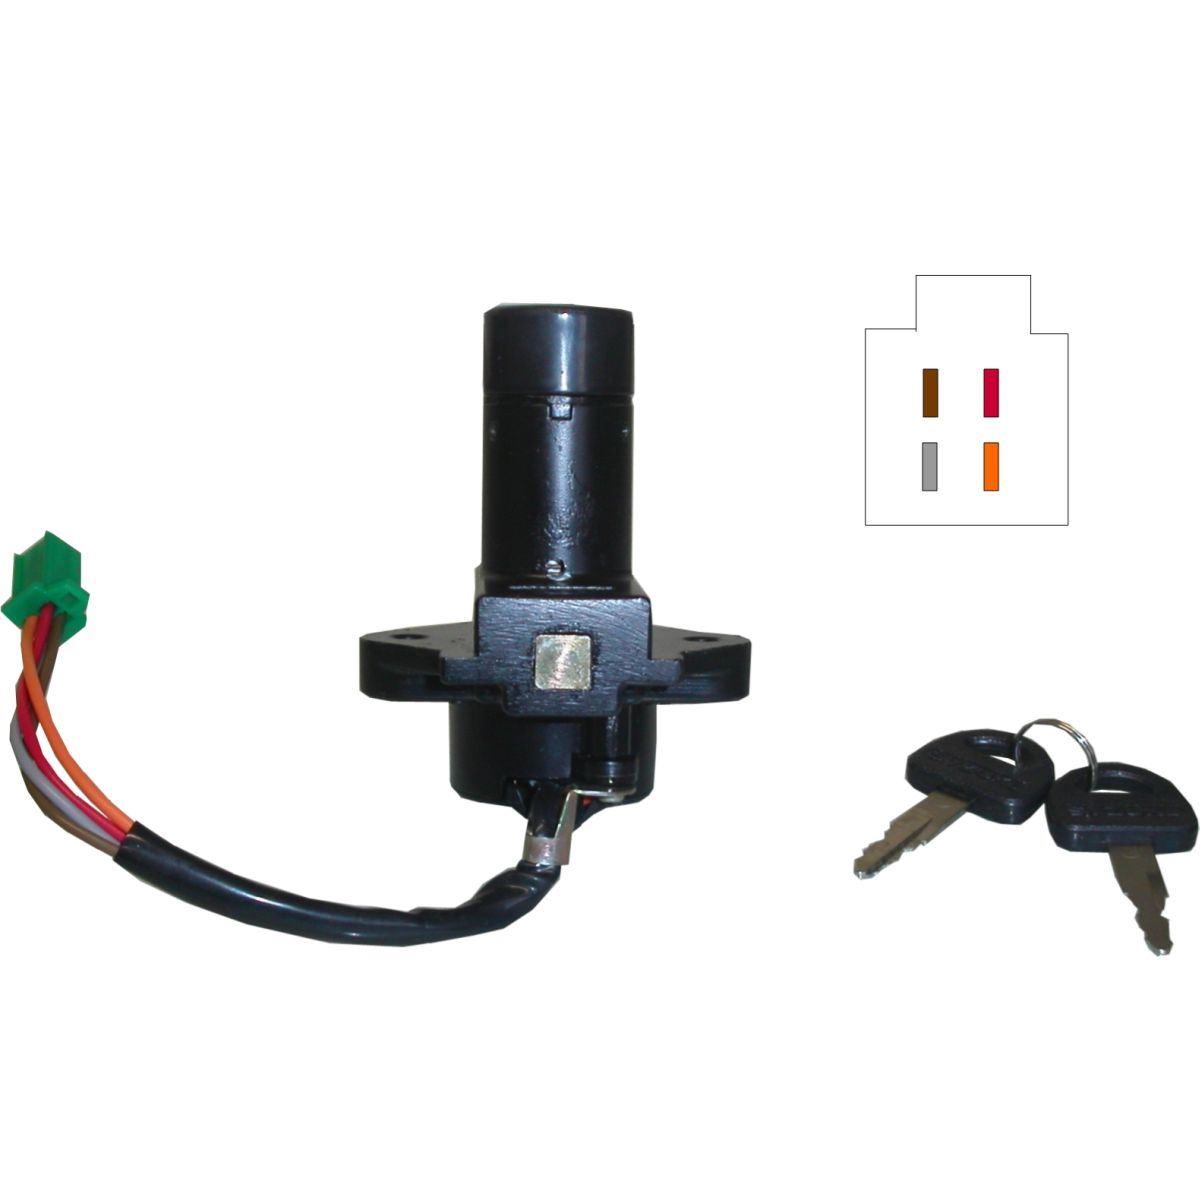 Ignition Switch For 1981 Suzuki Gs 500 Ex Ebay 4 Wire Wiring Image Is Loading